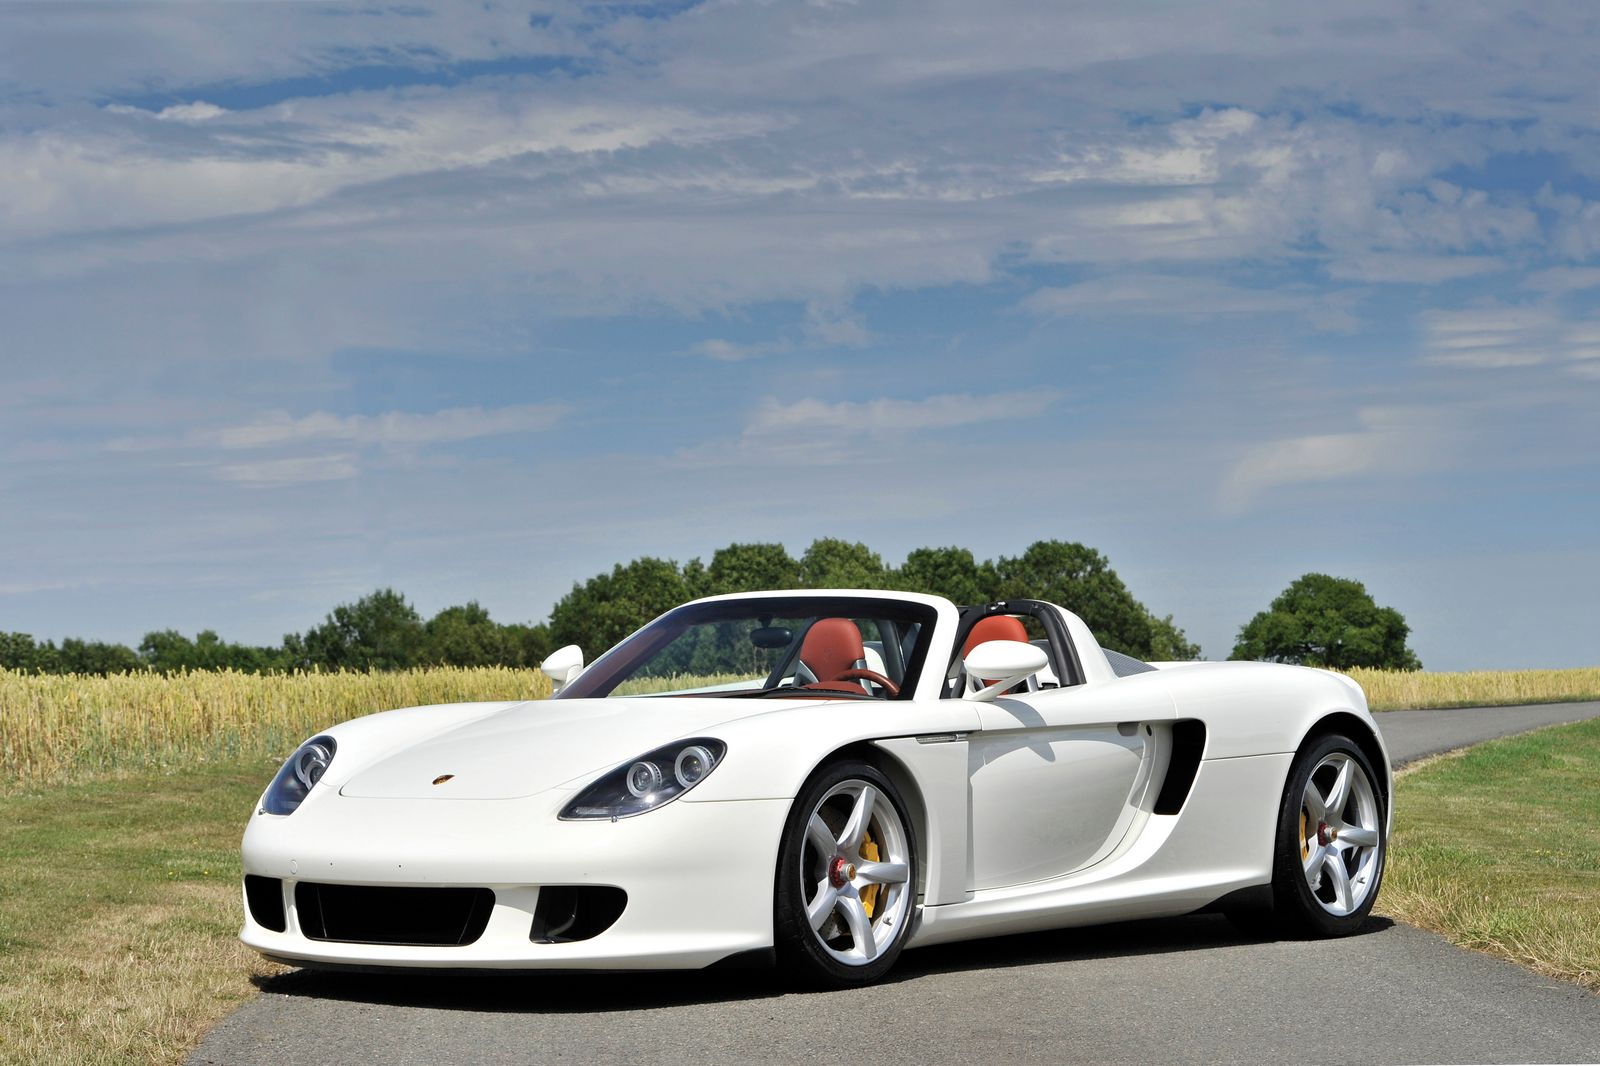 Whimiscally White Porsche Carrera GT Heading to Auction - GTspirit